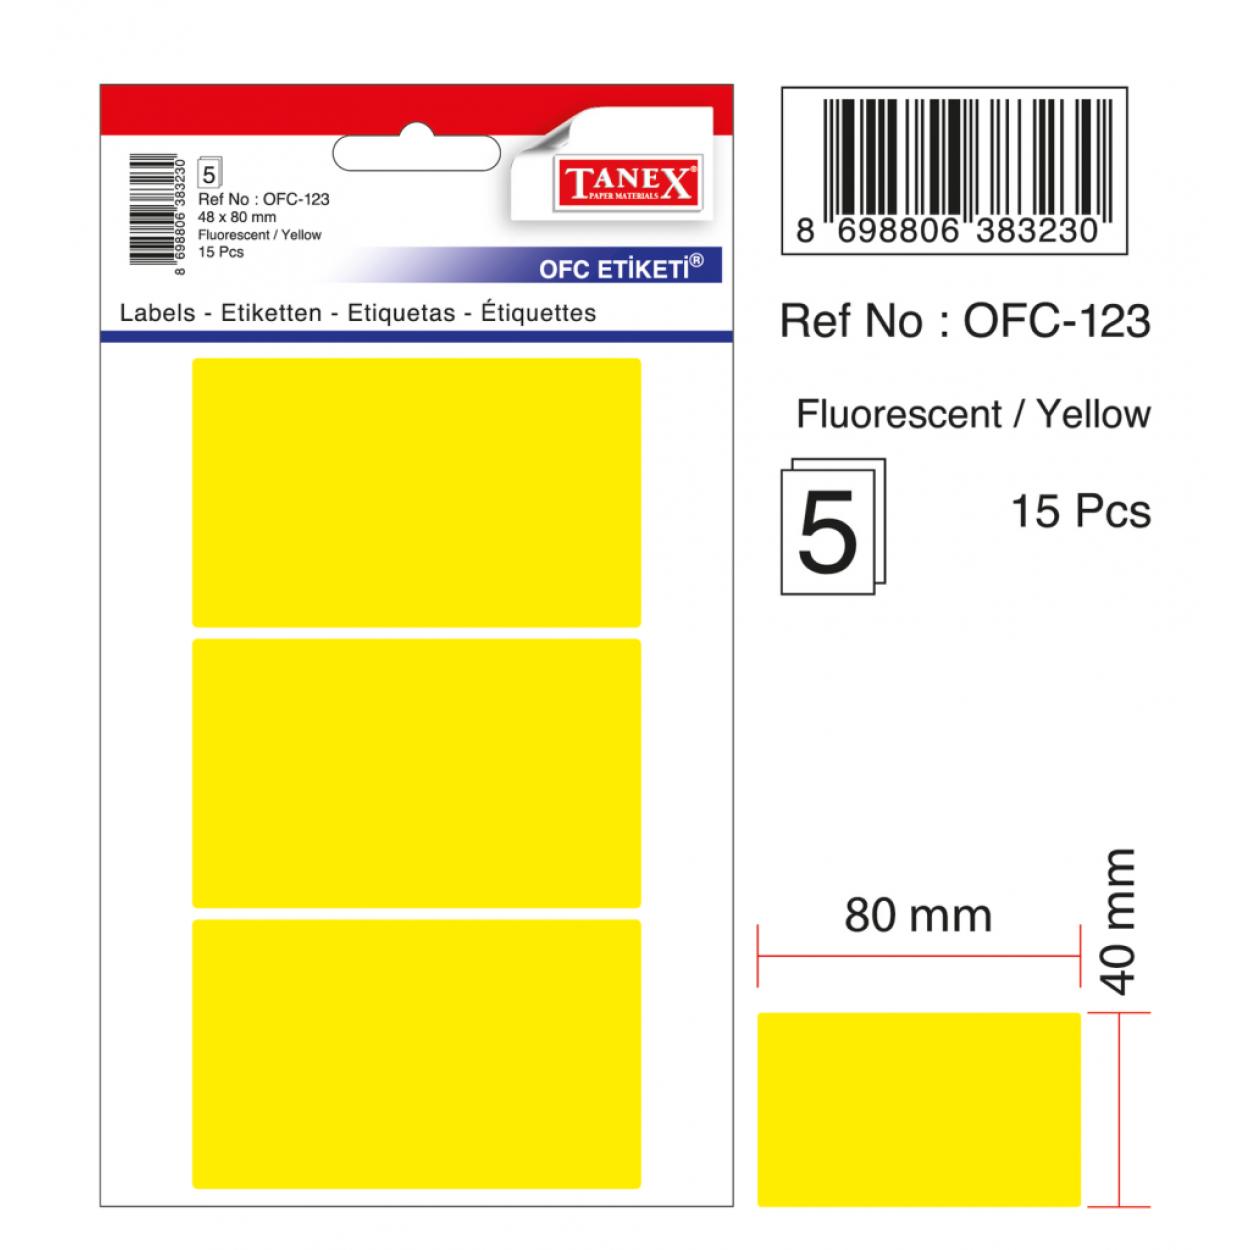 Tanex Ofc-123 Flo Sarı Ofis Etiketi